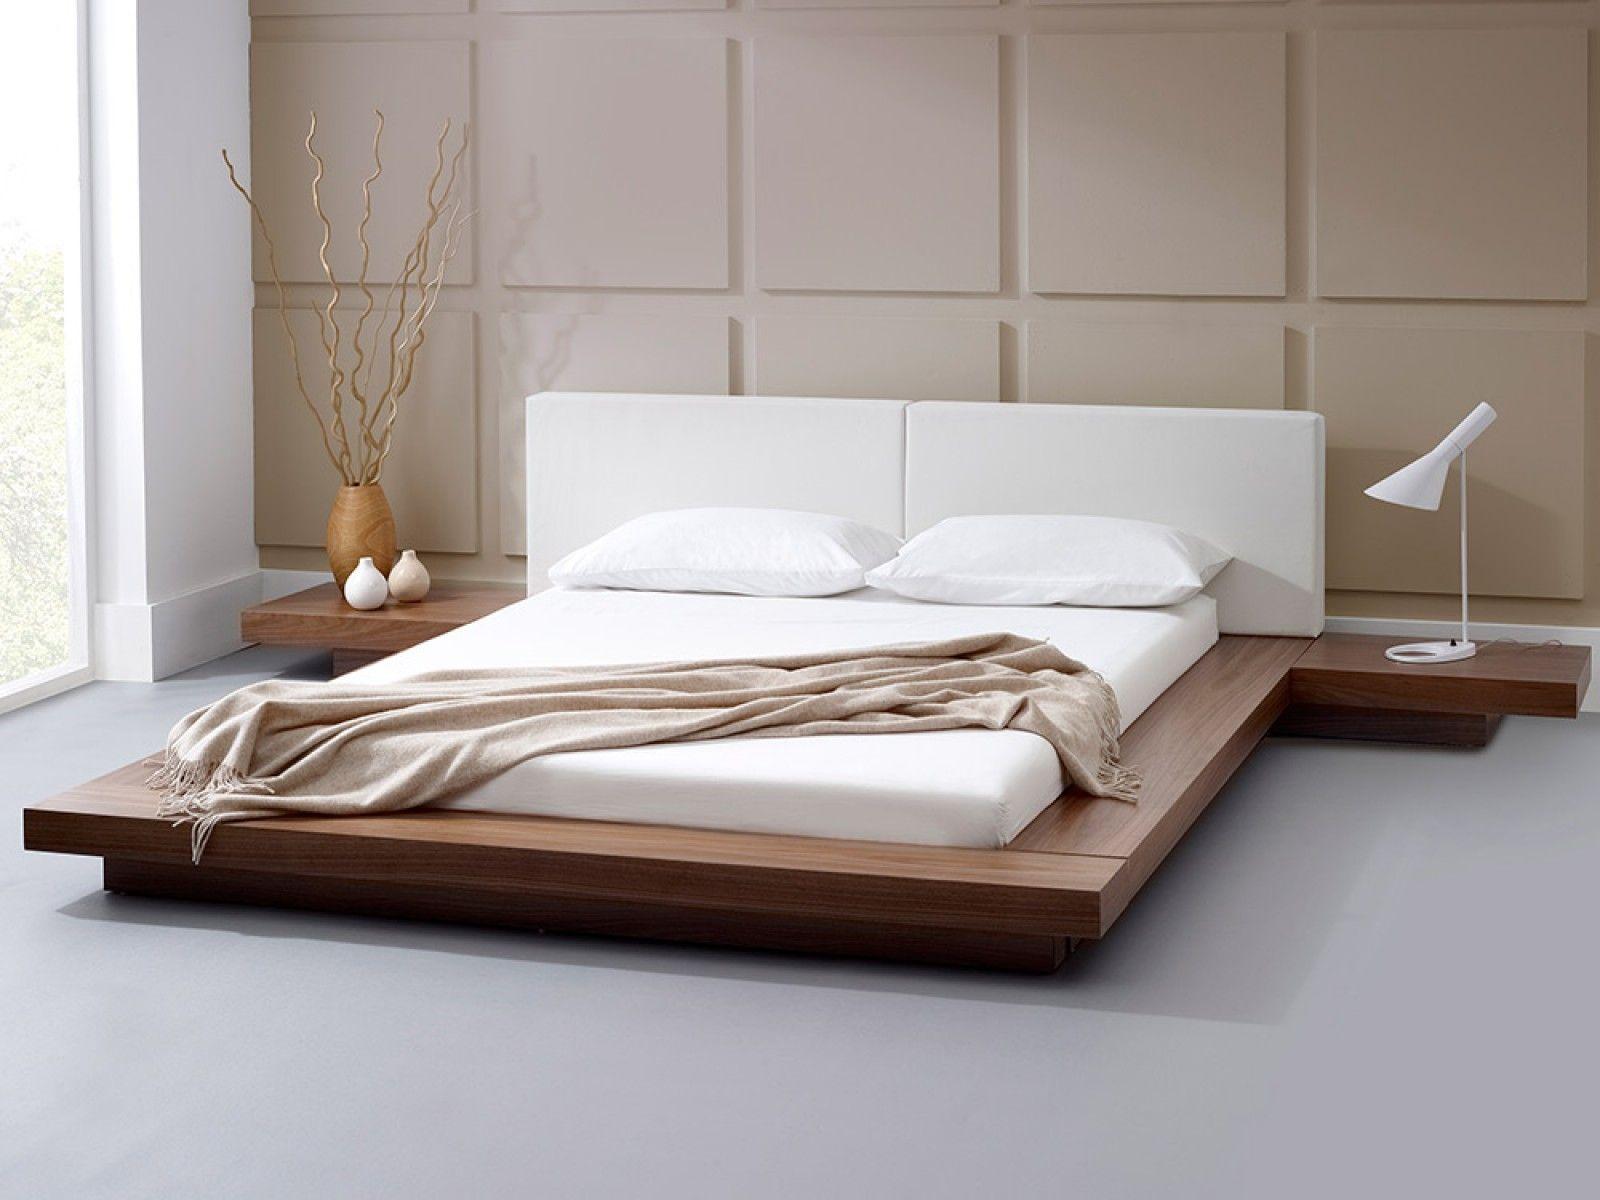 walnut bed c a c ae c c ae a ae a a c ae pinterest